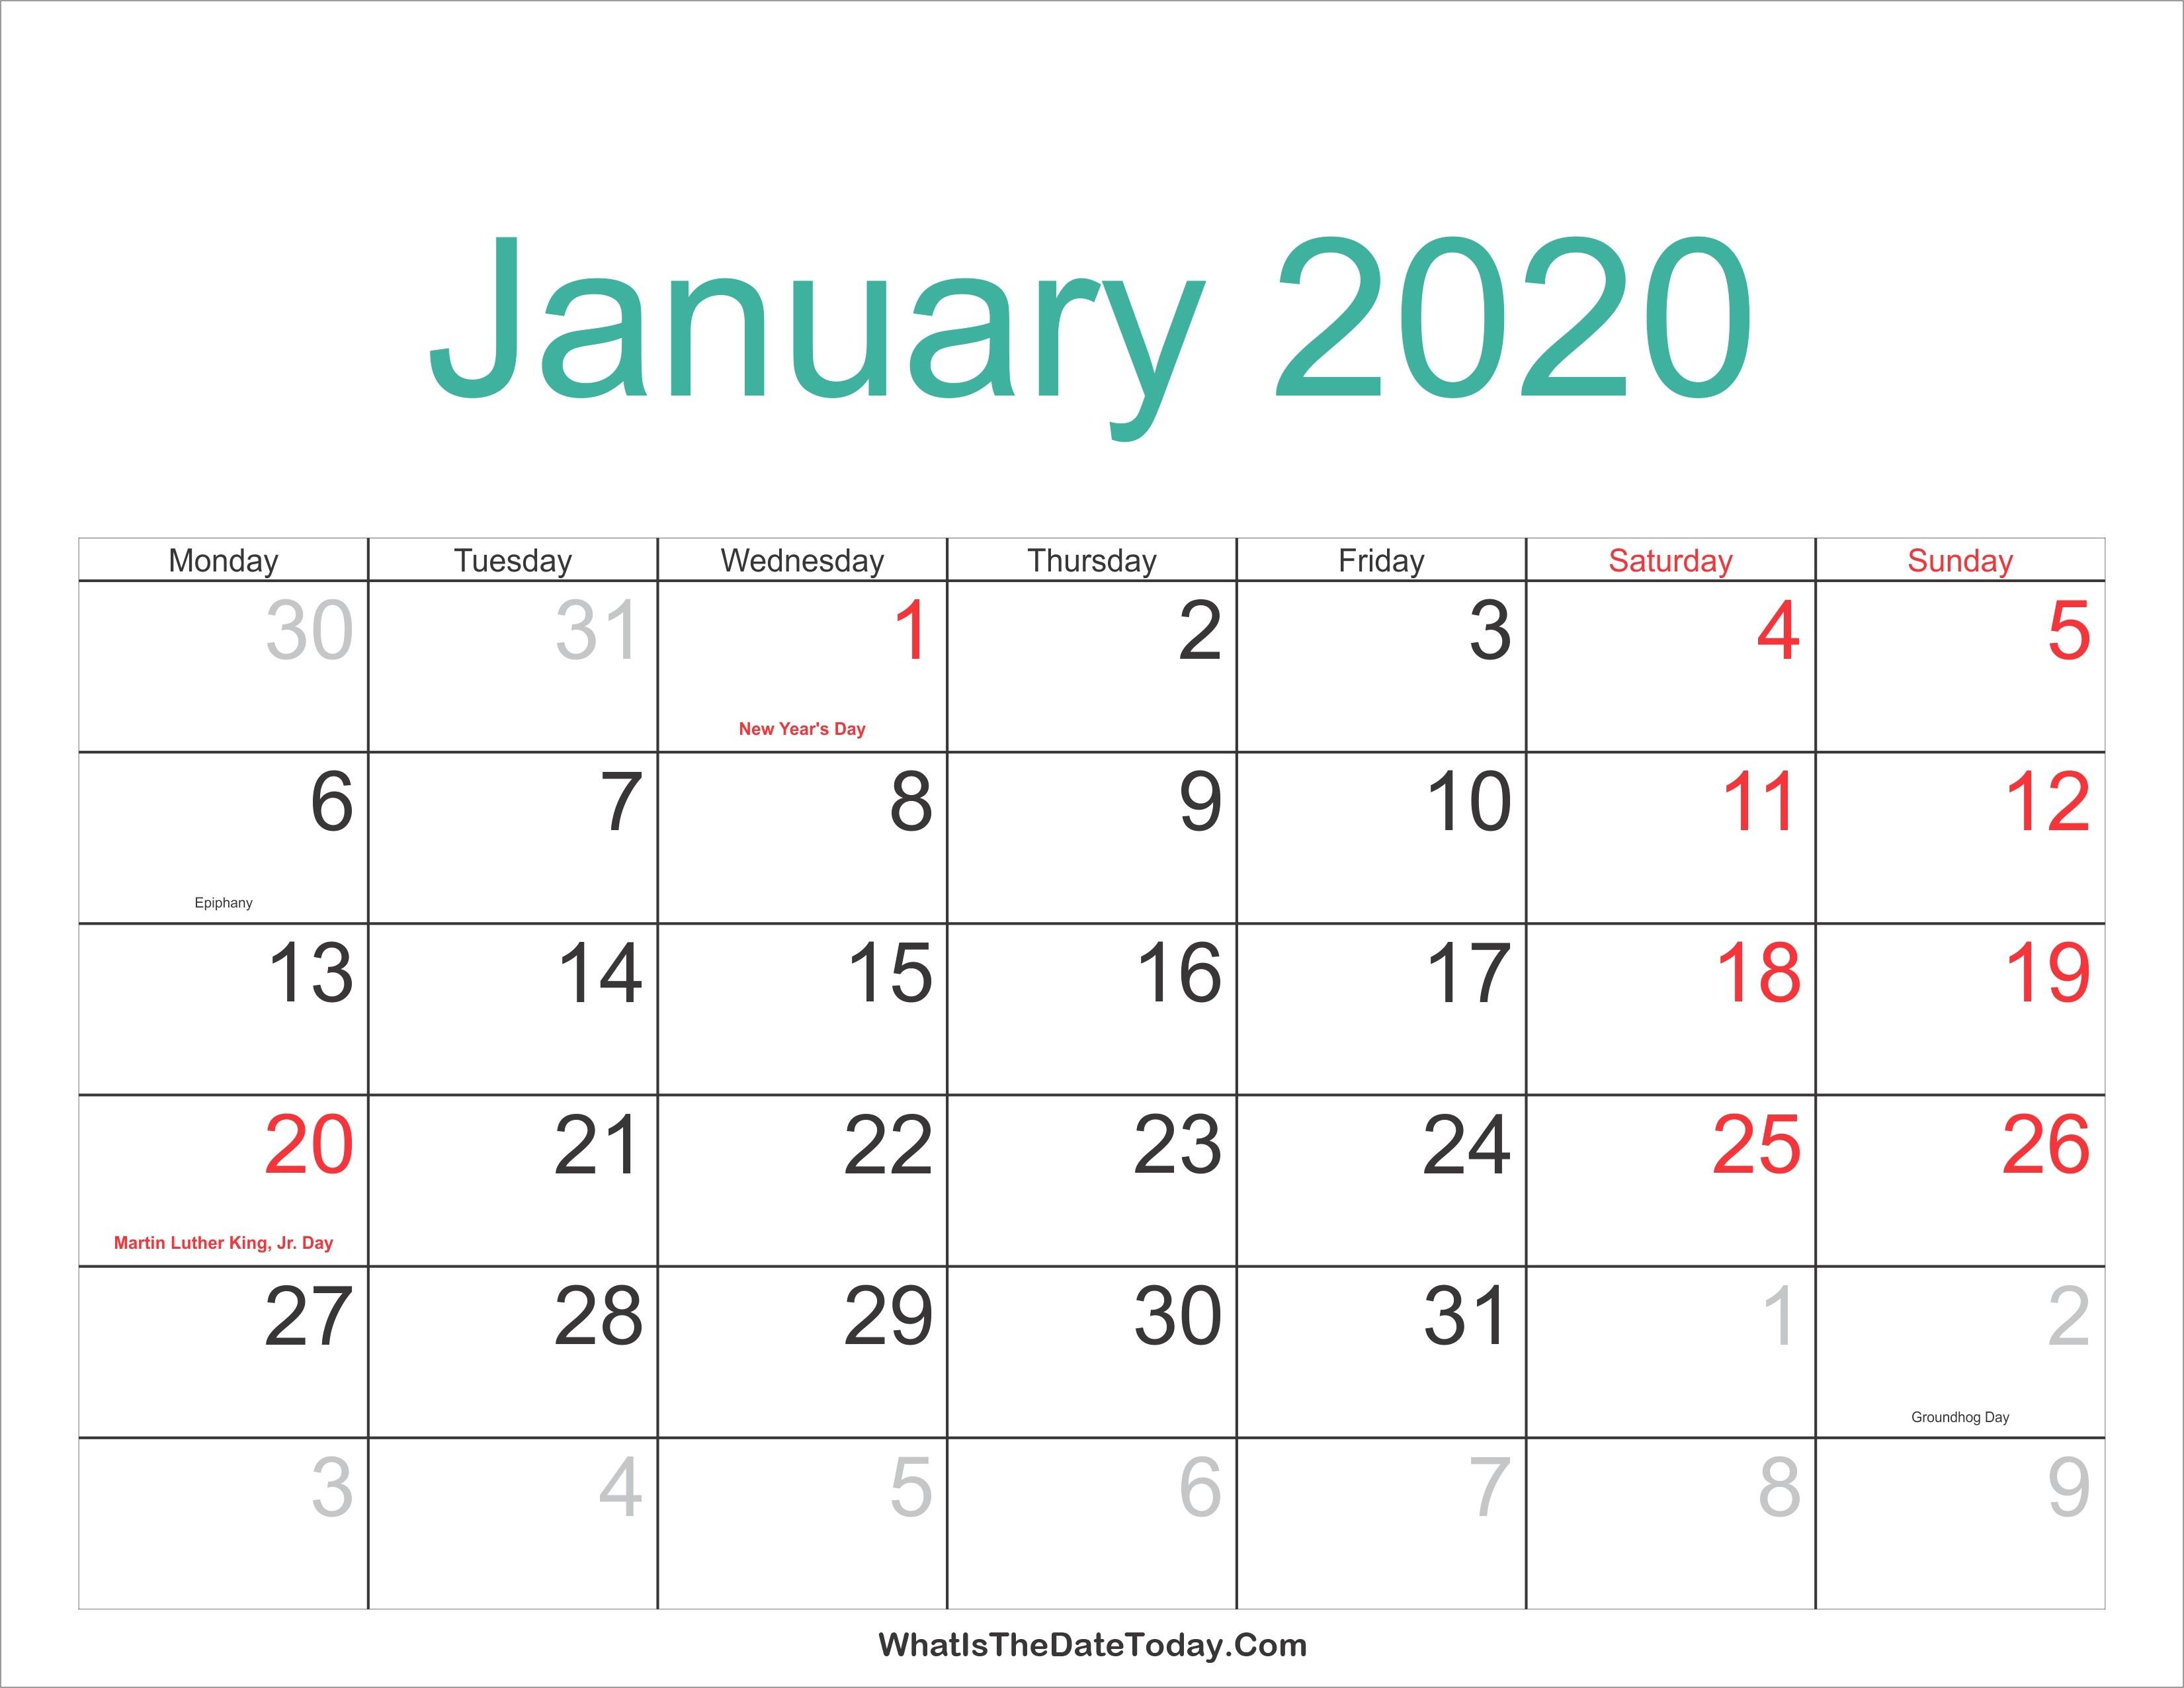 January 2020 Calendar Printable Holidays Full | Jcreview-January 2020 Calendar Full Moon